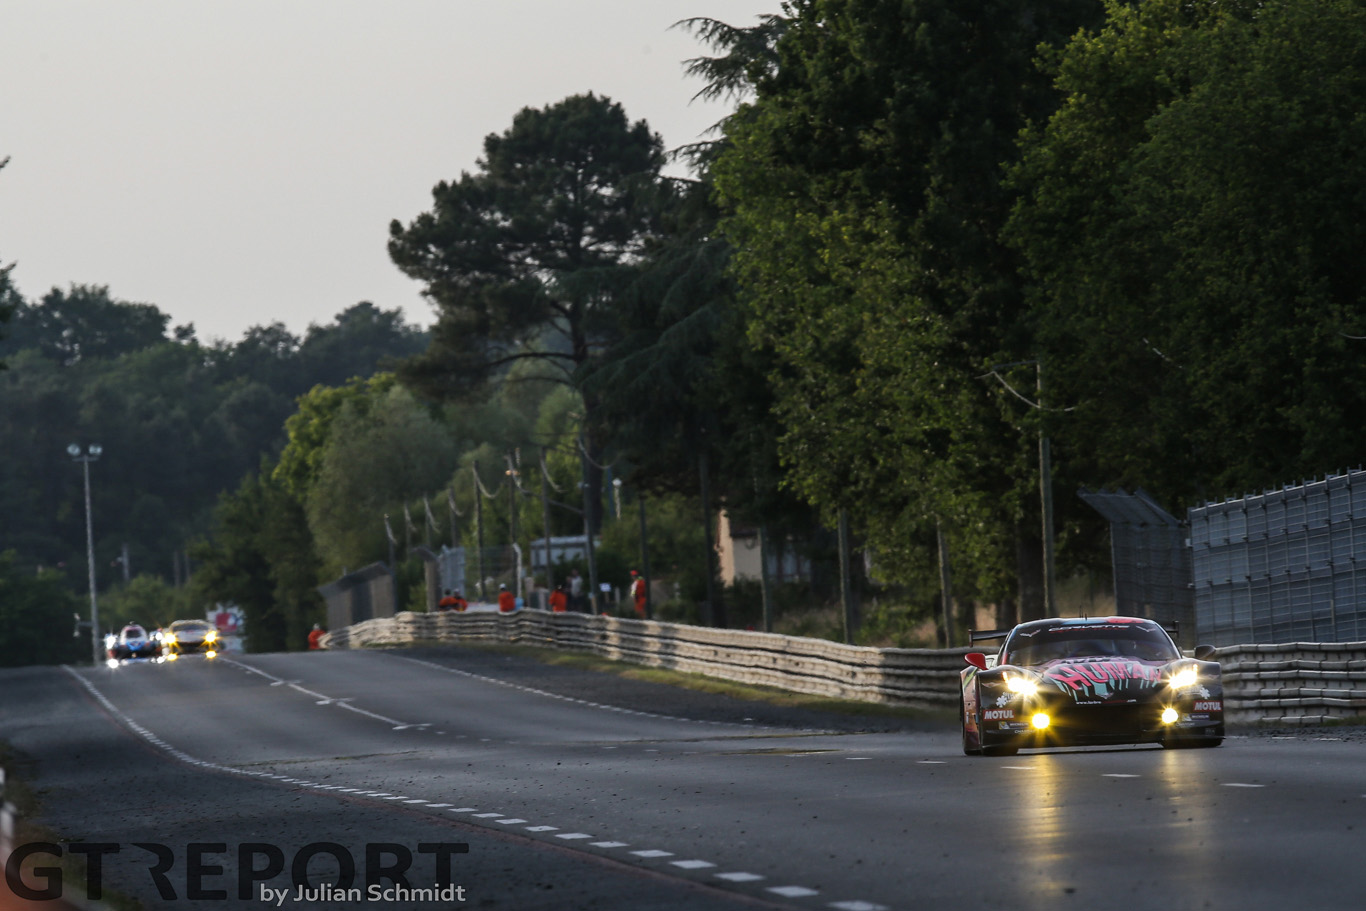 24 Hours of Le Mans: Live blog